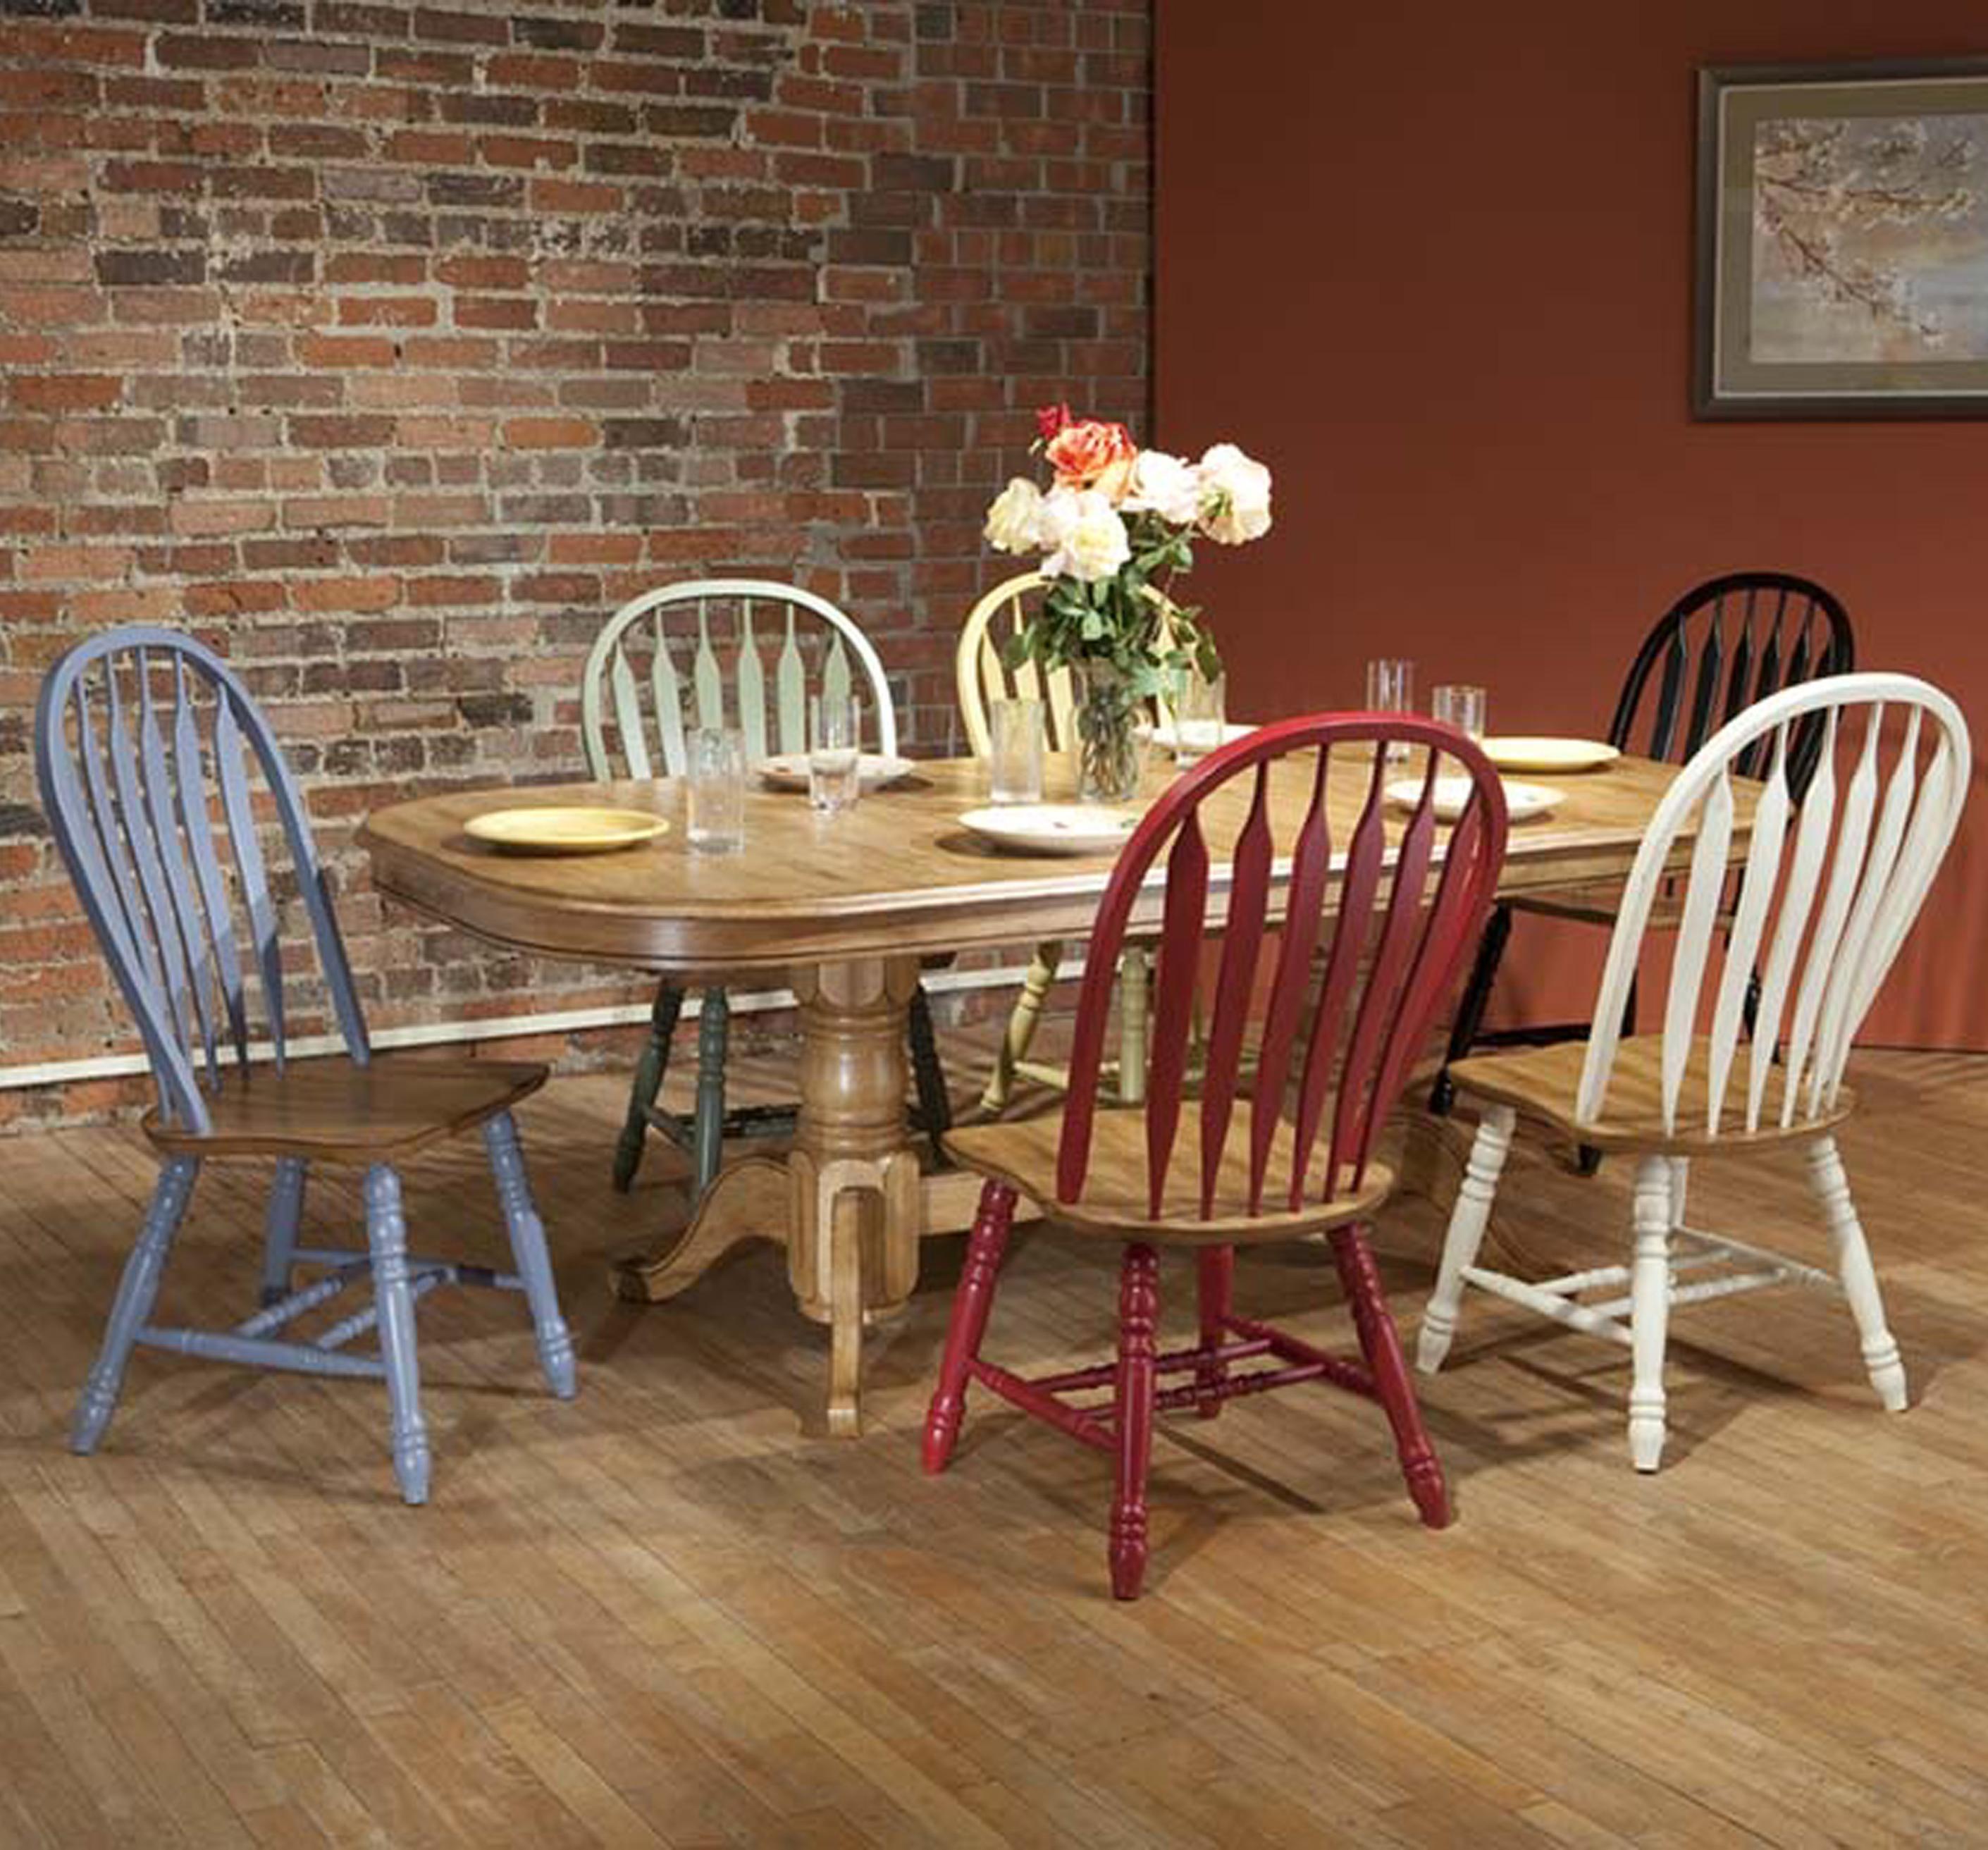 E.C.I. Furniture Dining  7 Piece Set - Item Number: 2100-04-T/B/2190-13/12/14/10/20/15